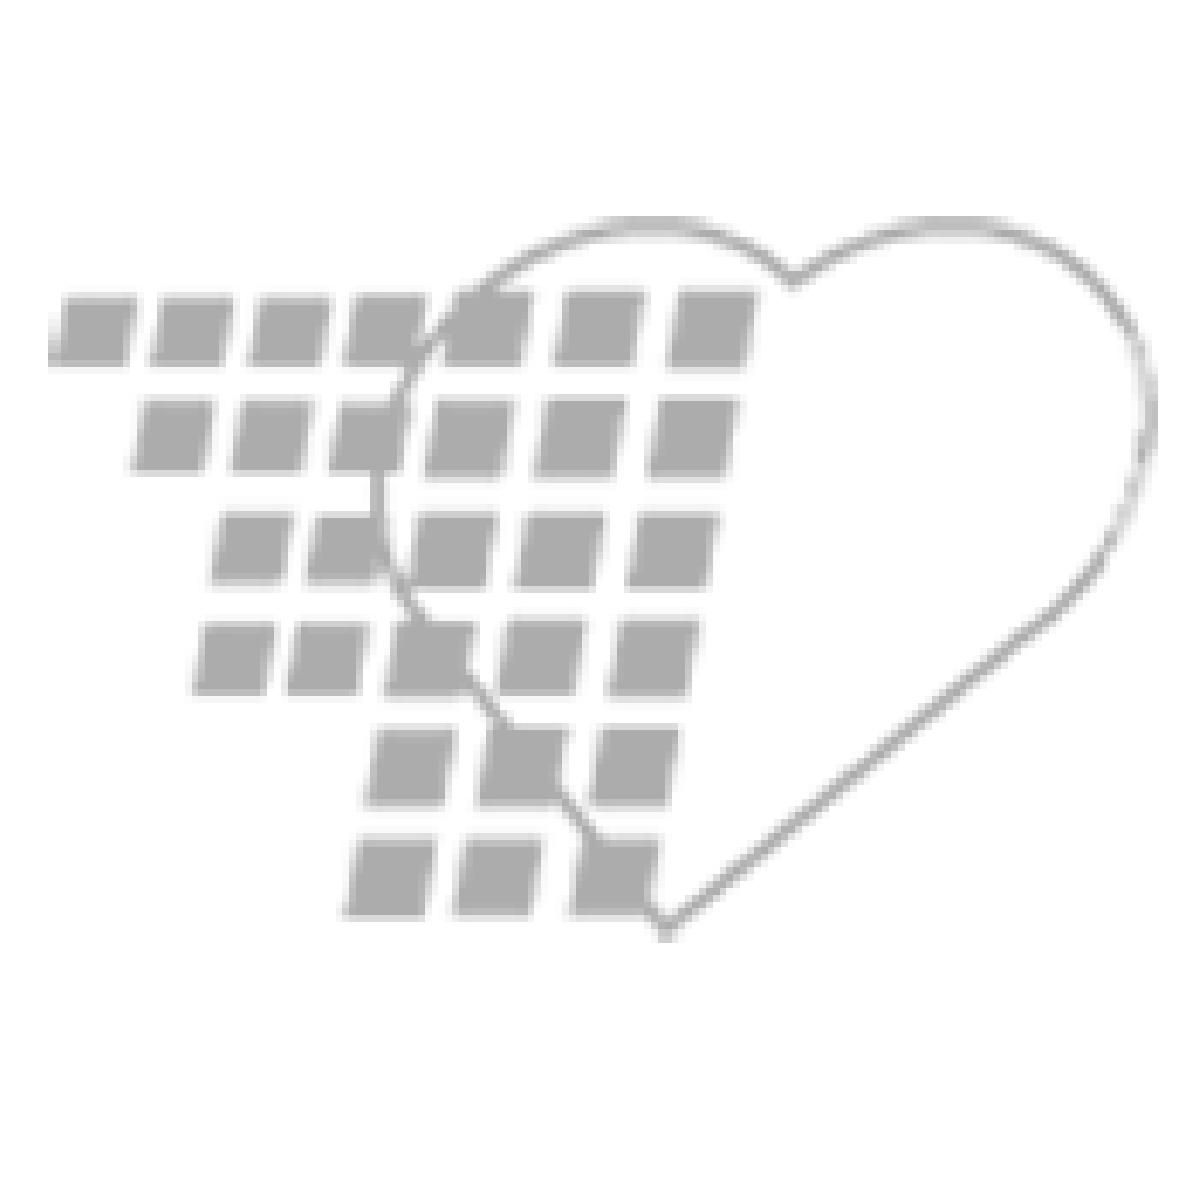 06-93-6201 - Demo Dose® Simulated Platelets O Rh Negative